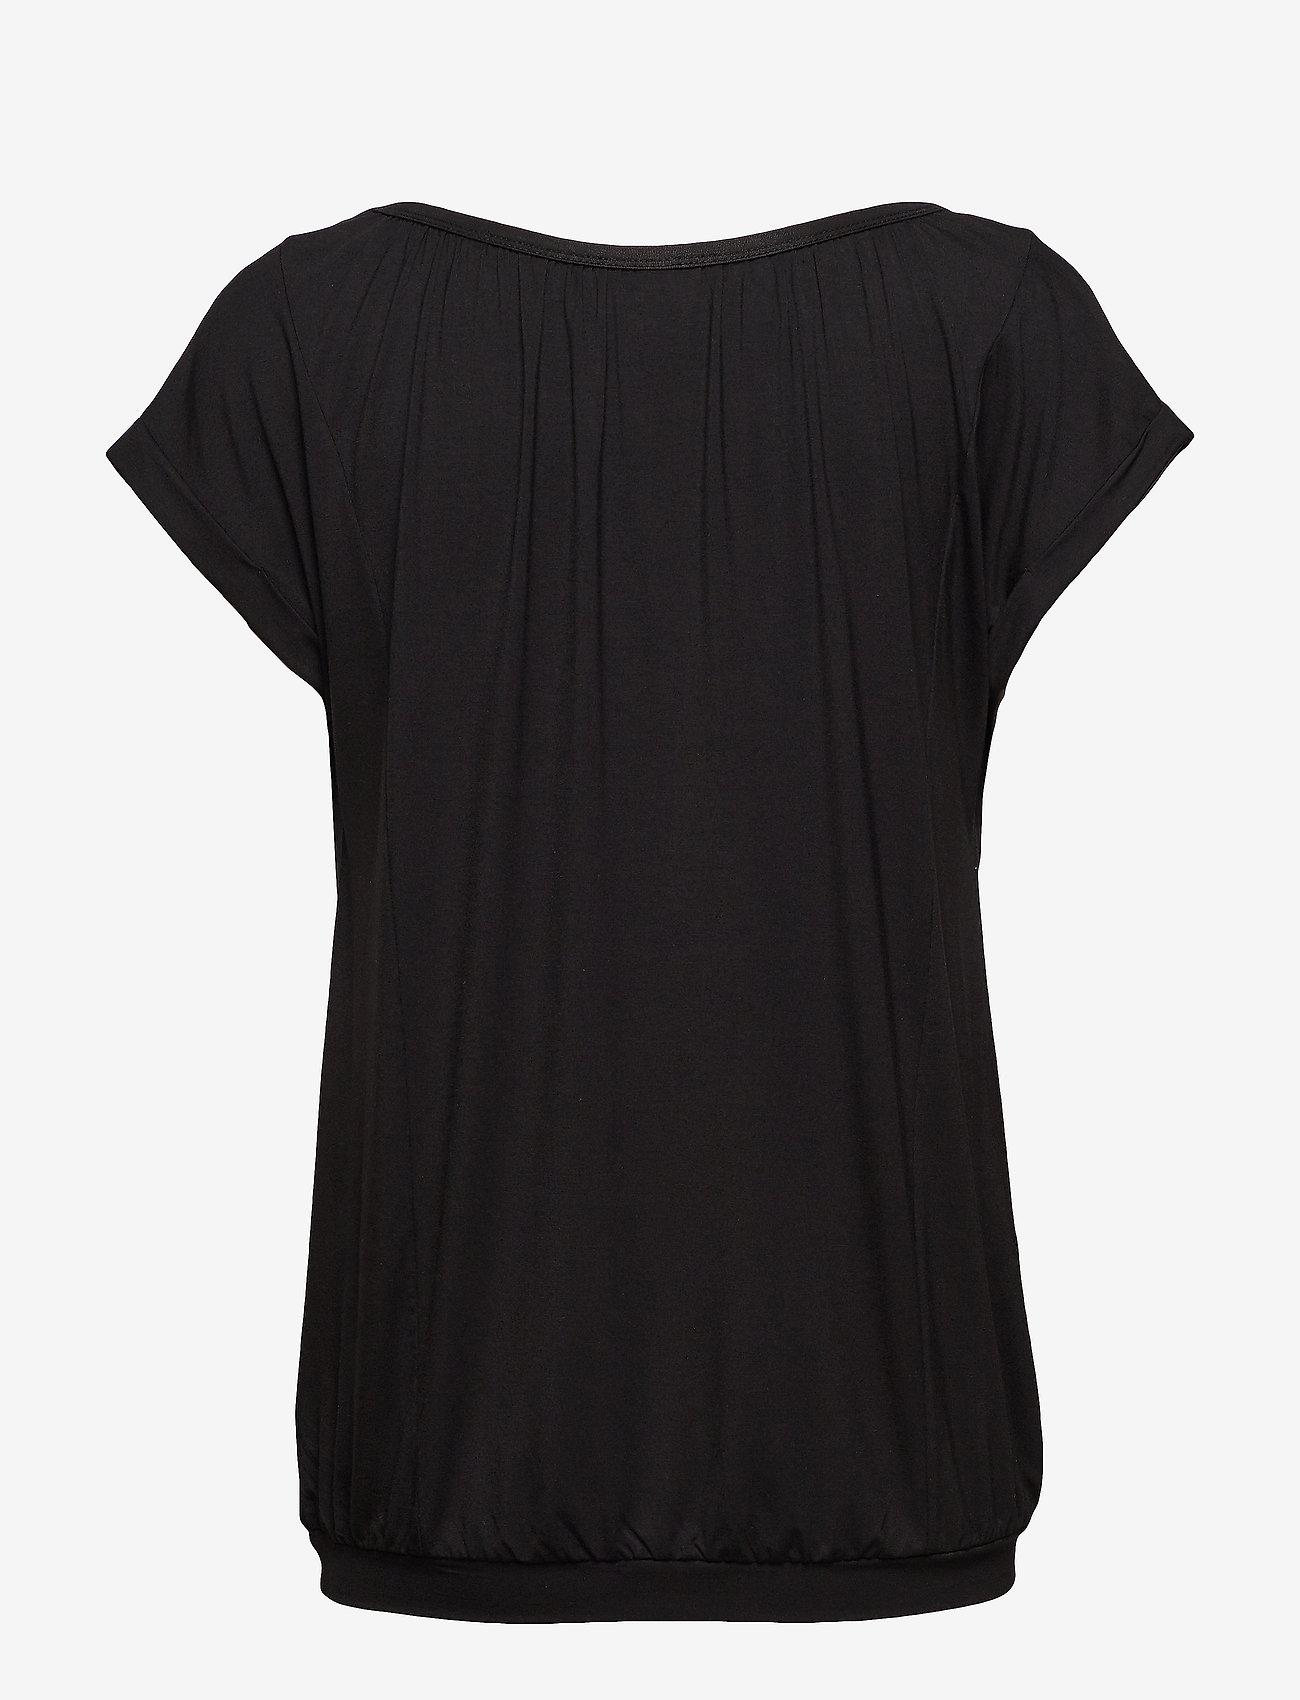 Soyaconcept - SC-MARICA - t-shirts - black - 1